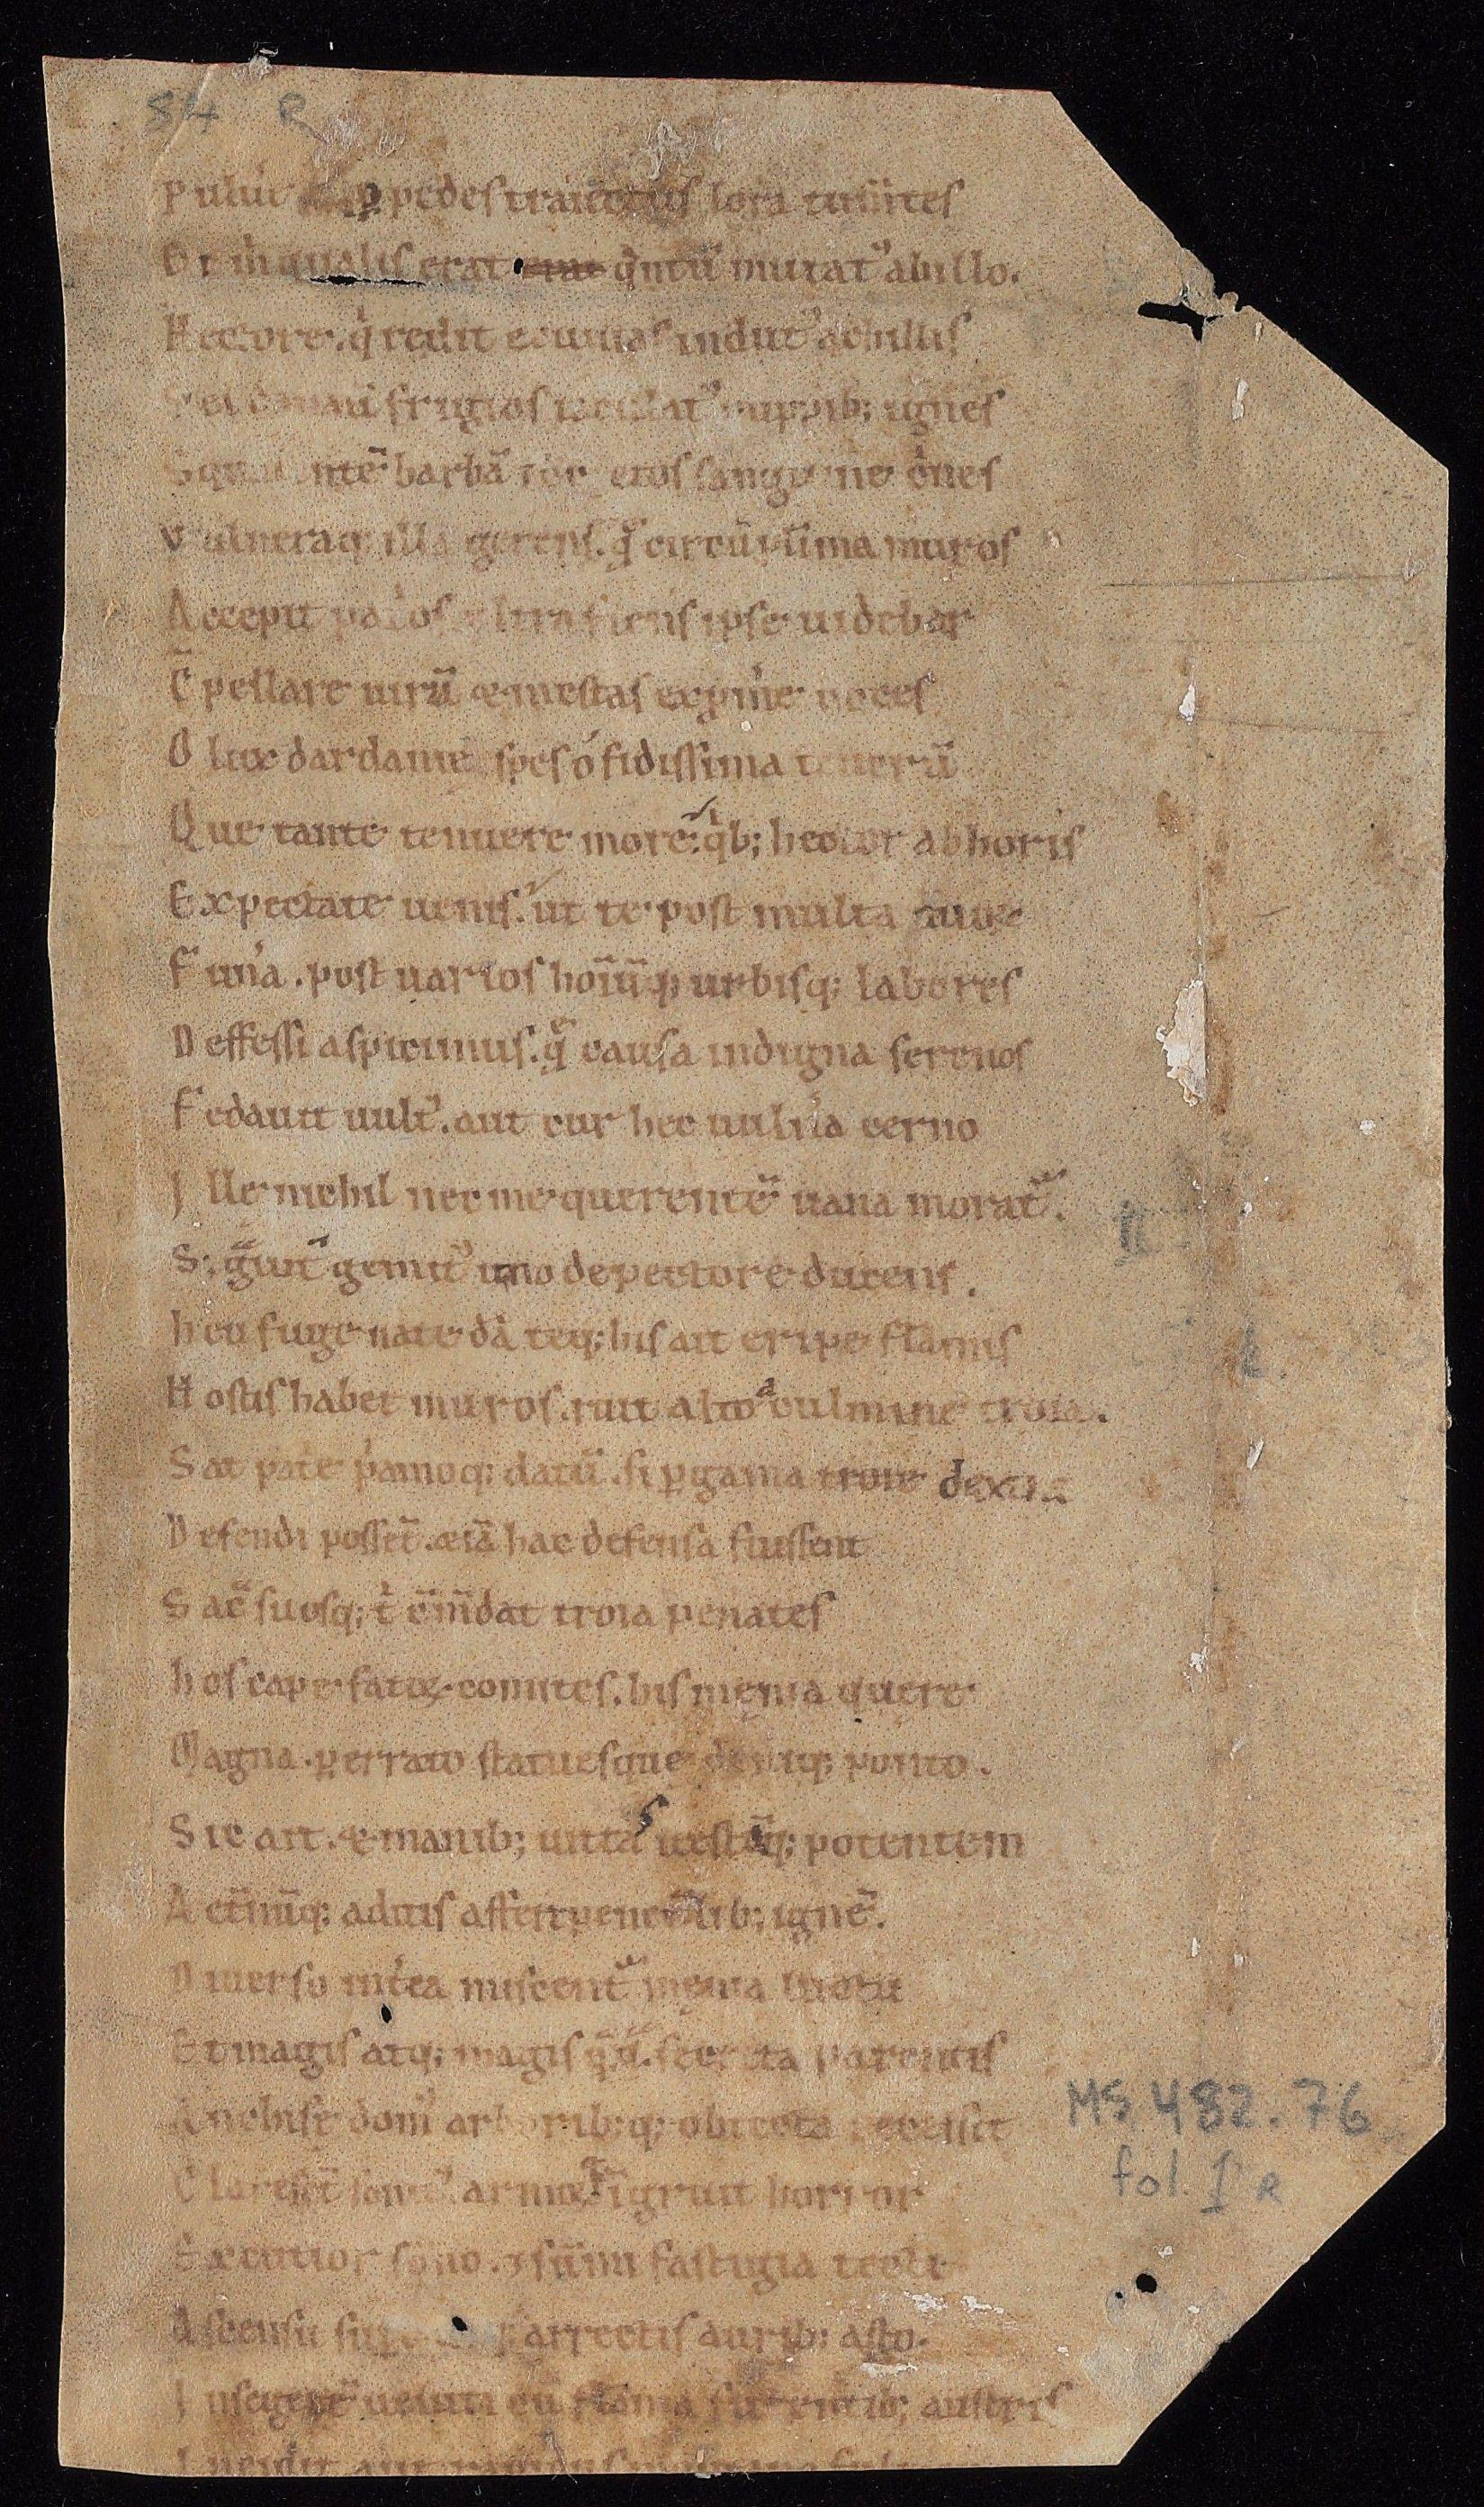 Aeneid Fragment Beinecke MS 482.76